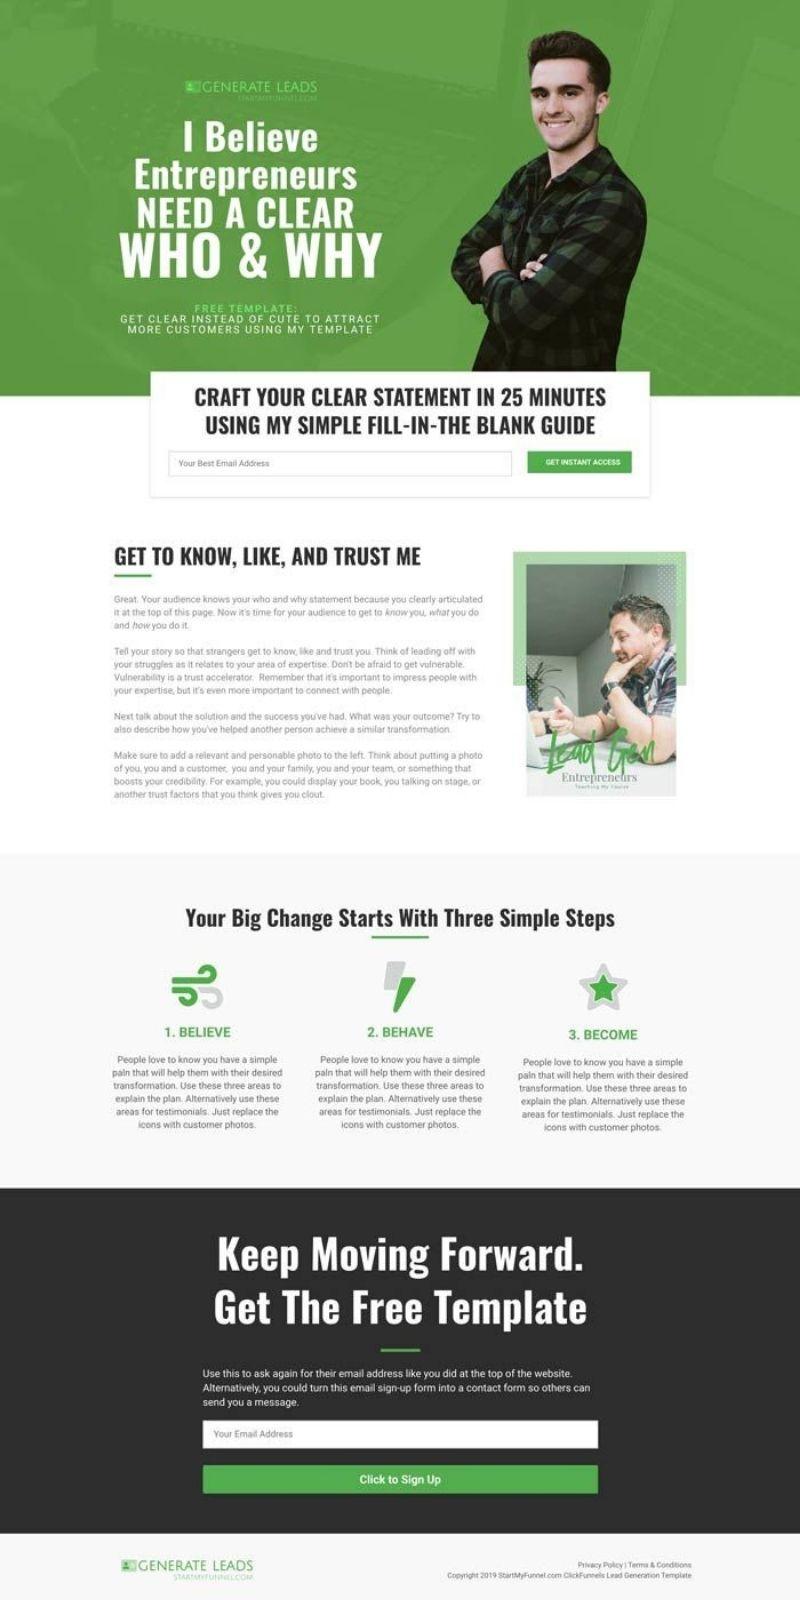 Lead generation clickfunnels template